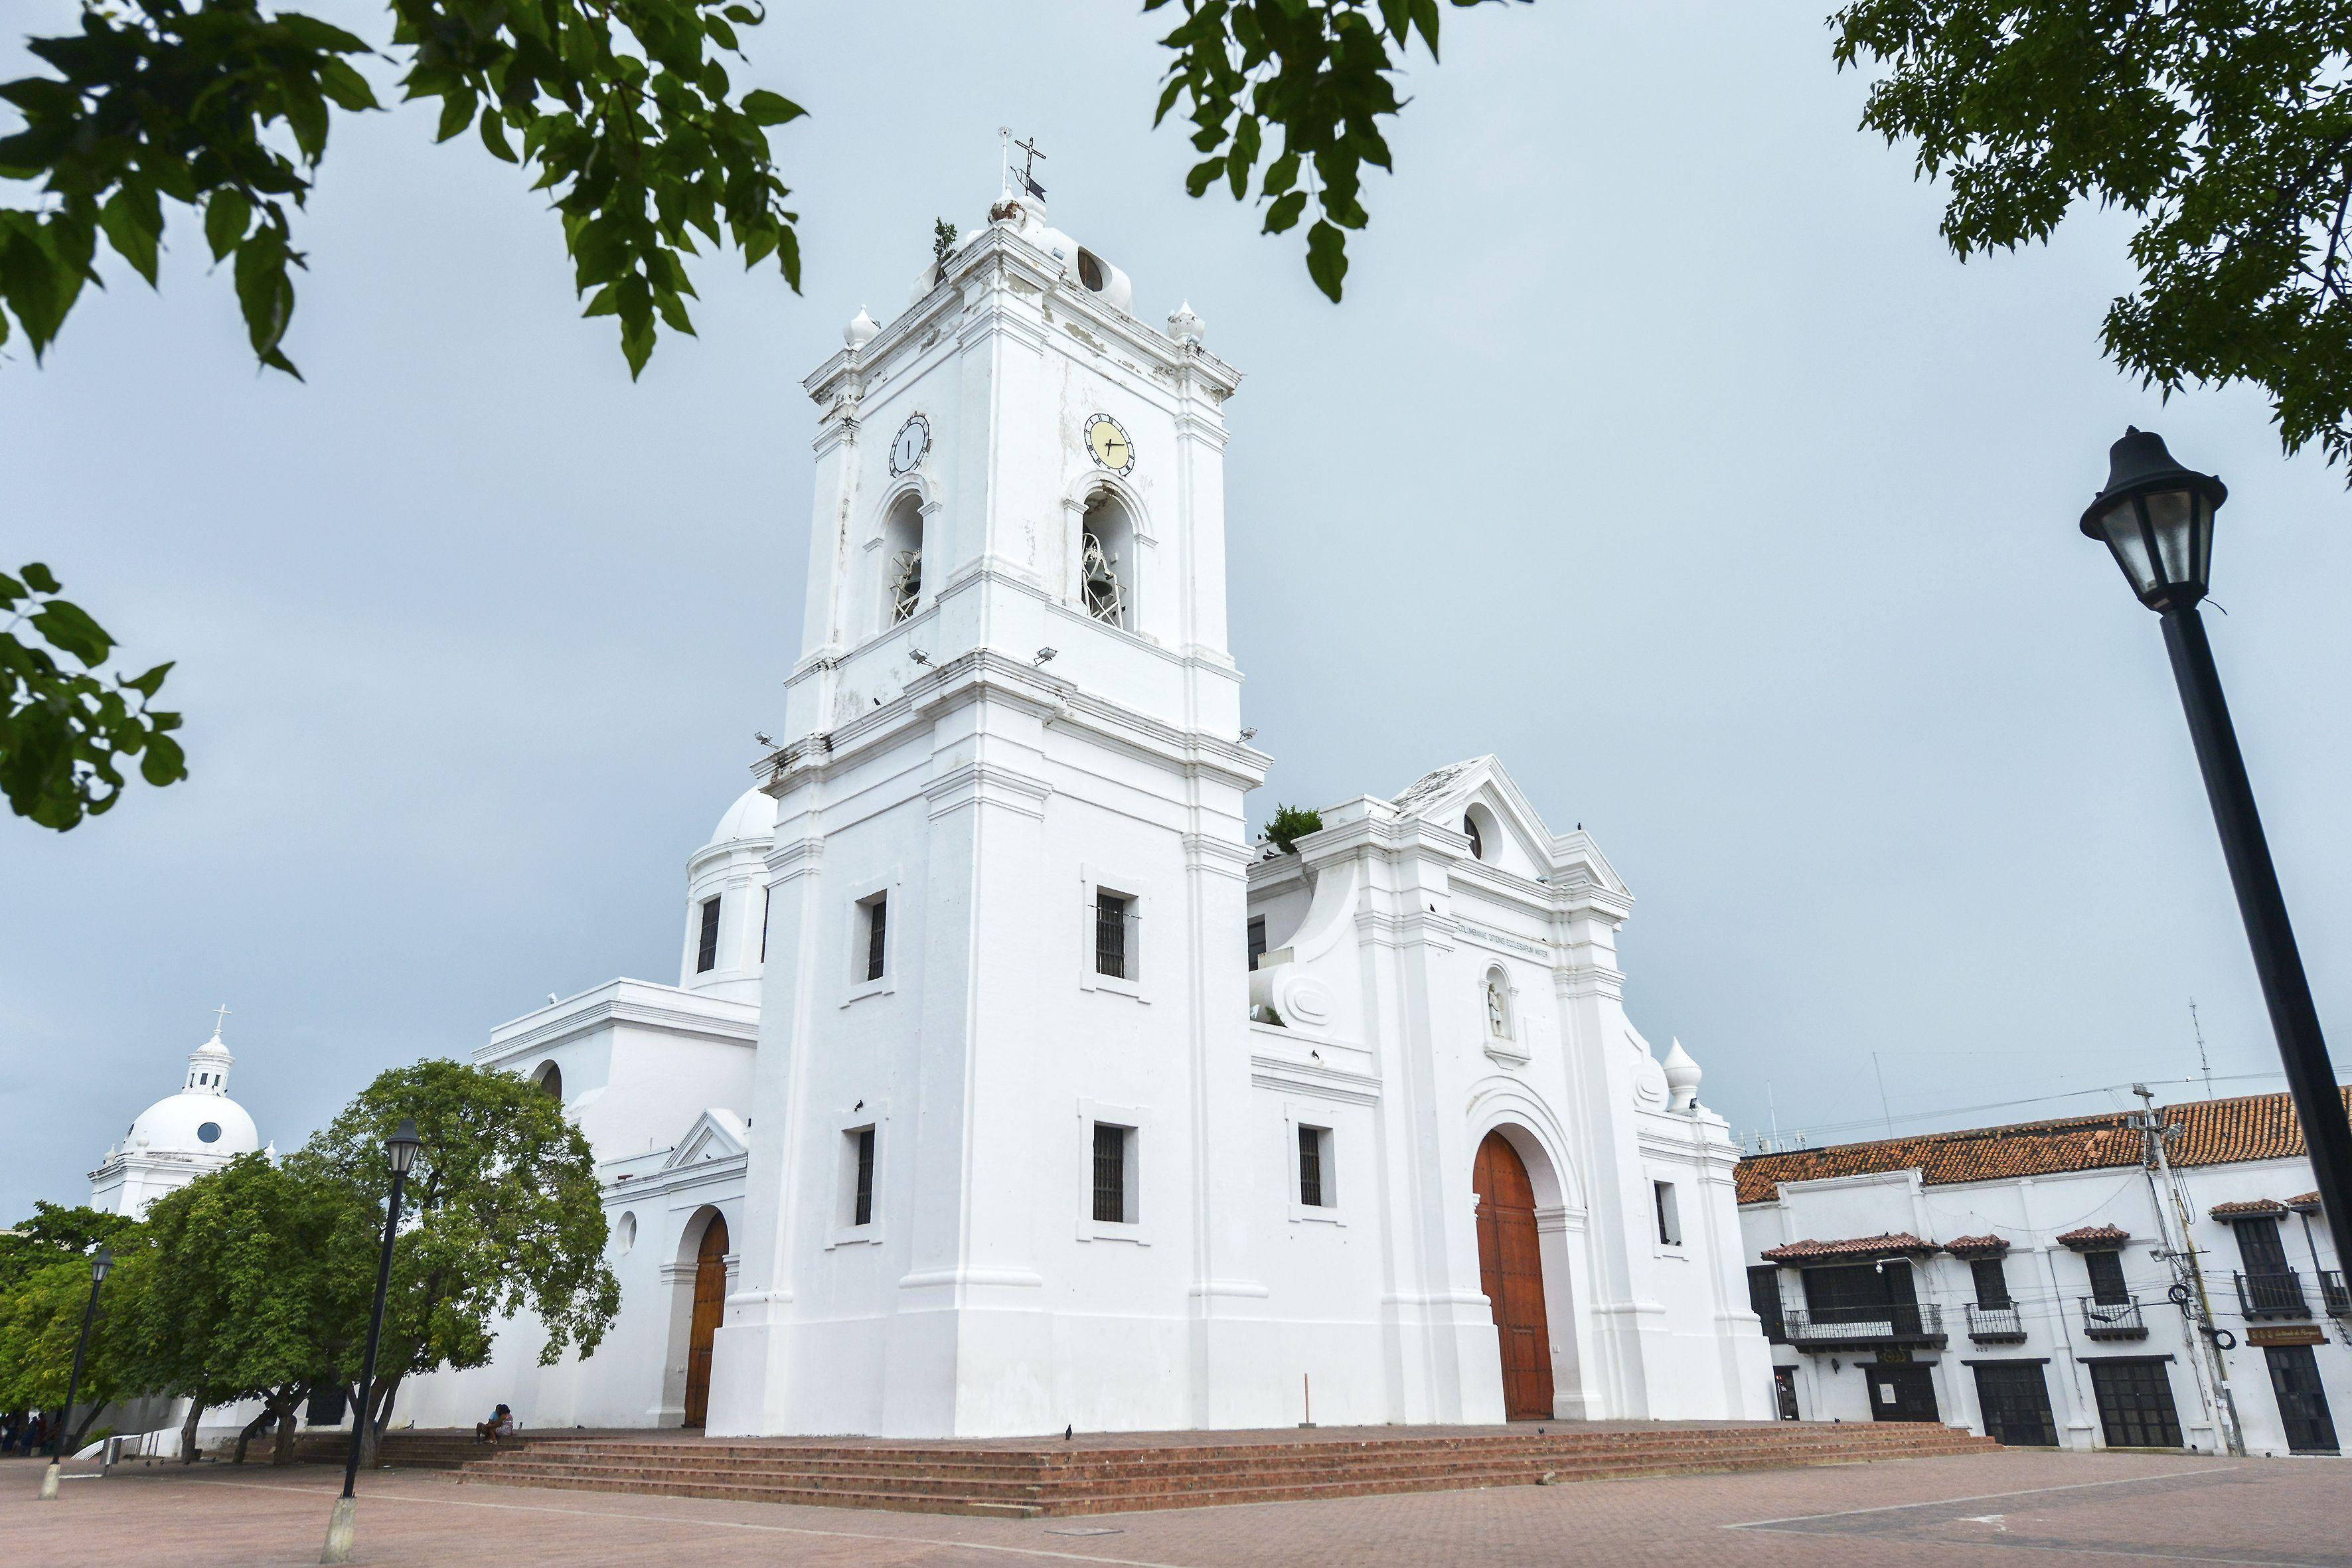 Cathedral of Santa Marta, Colombia